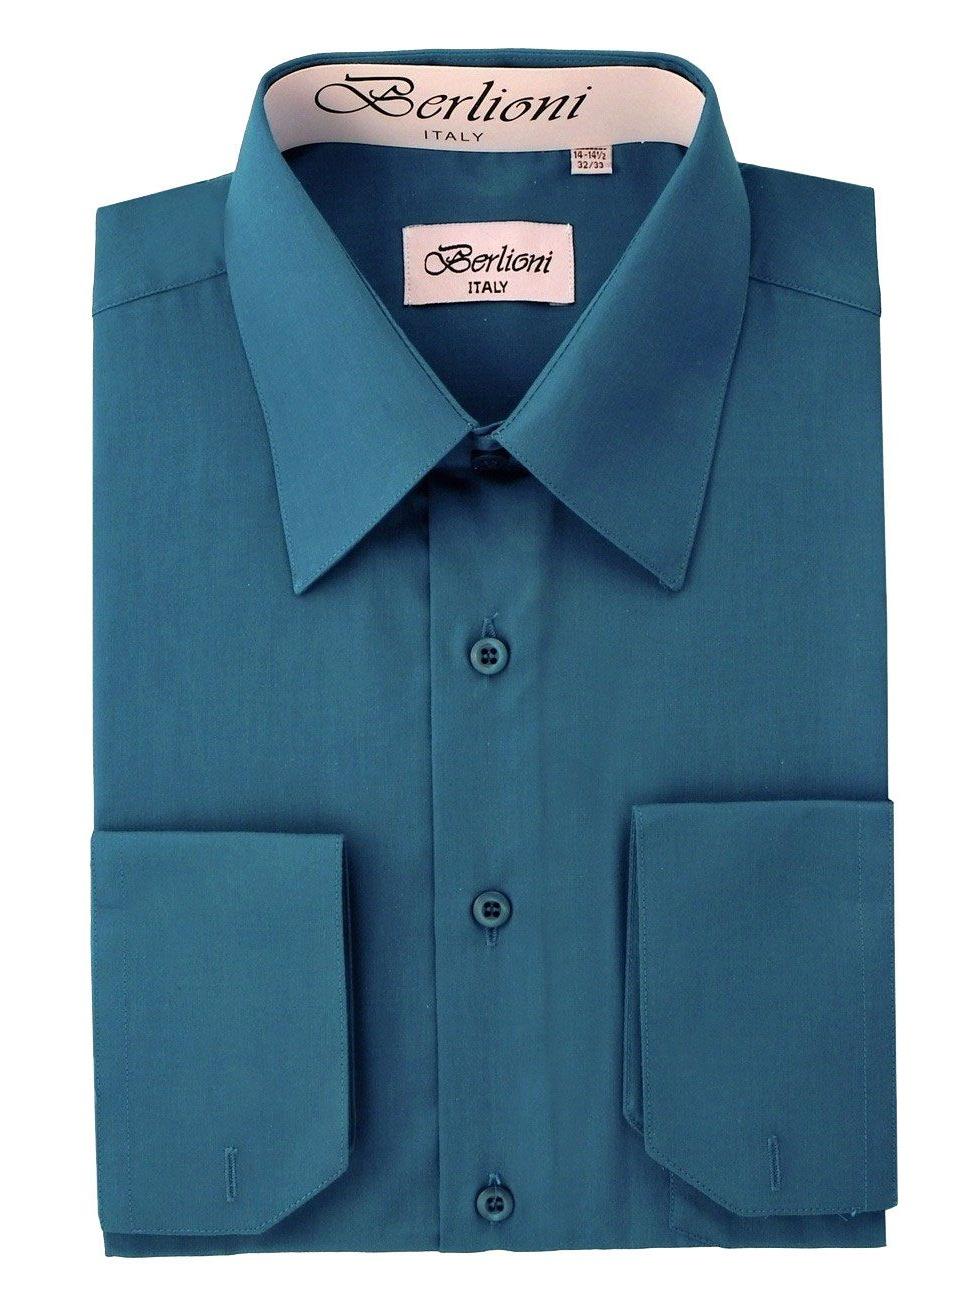 Men's Solid Color Dress Shirt